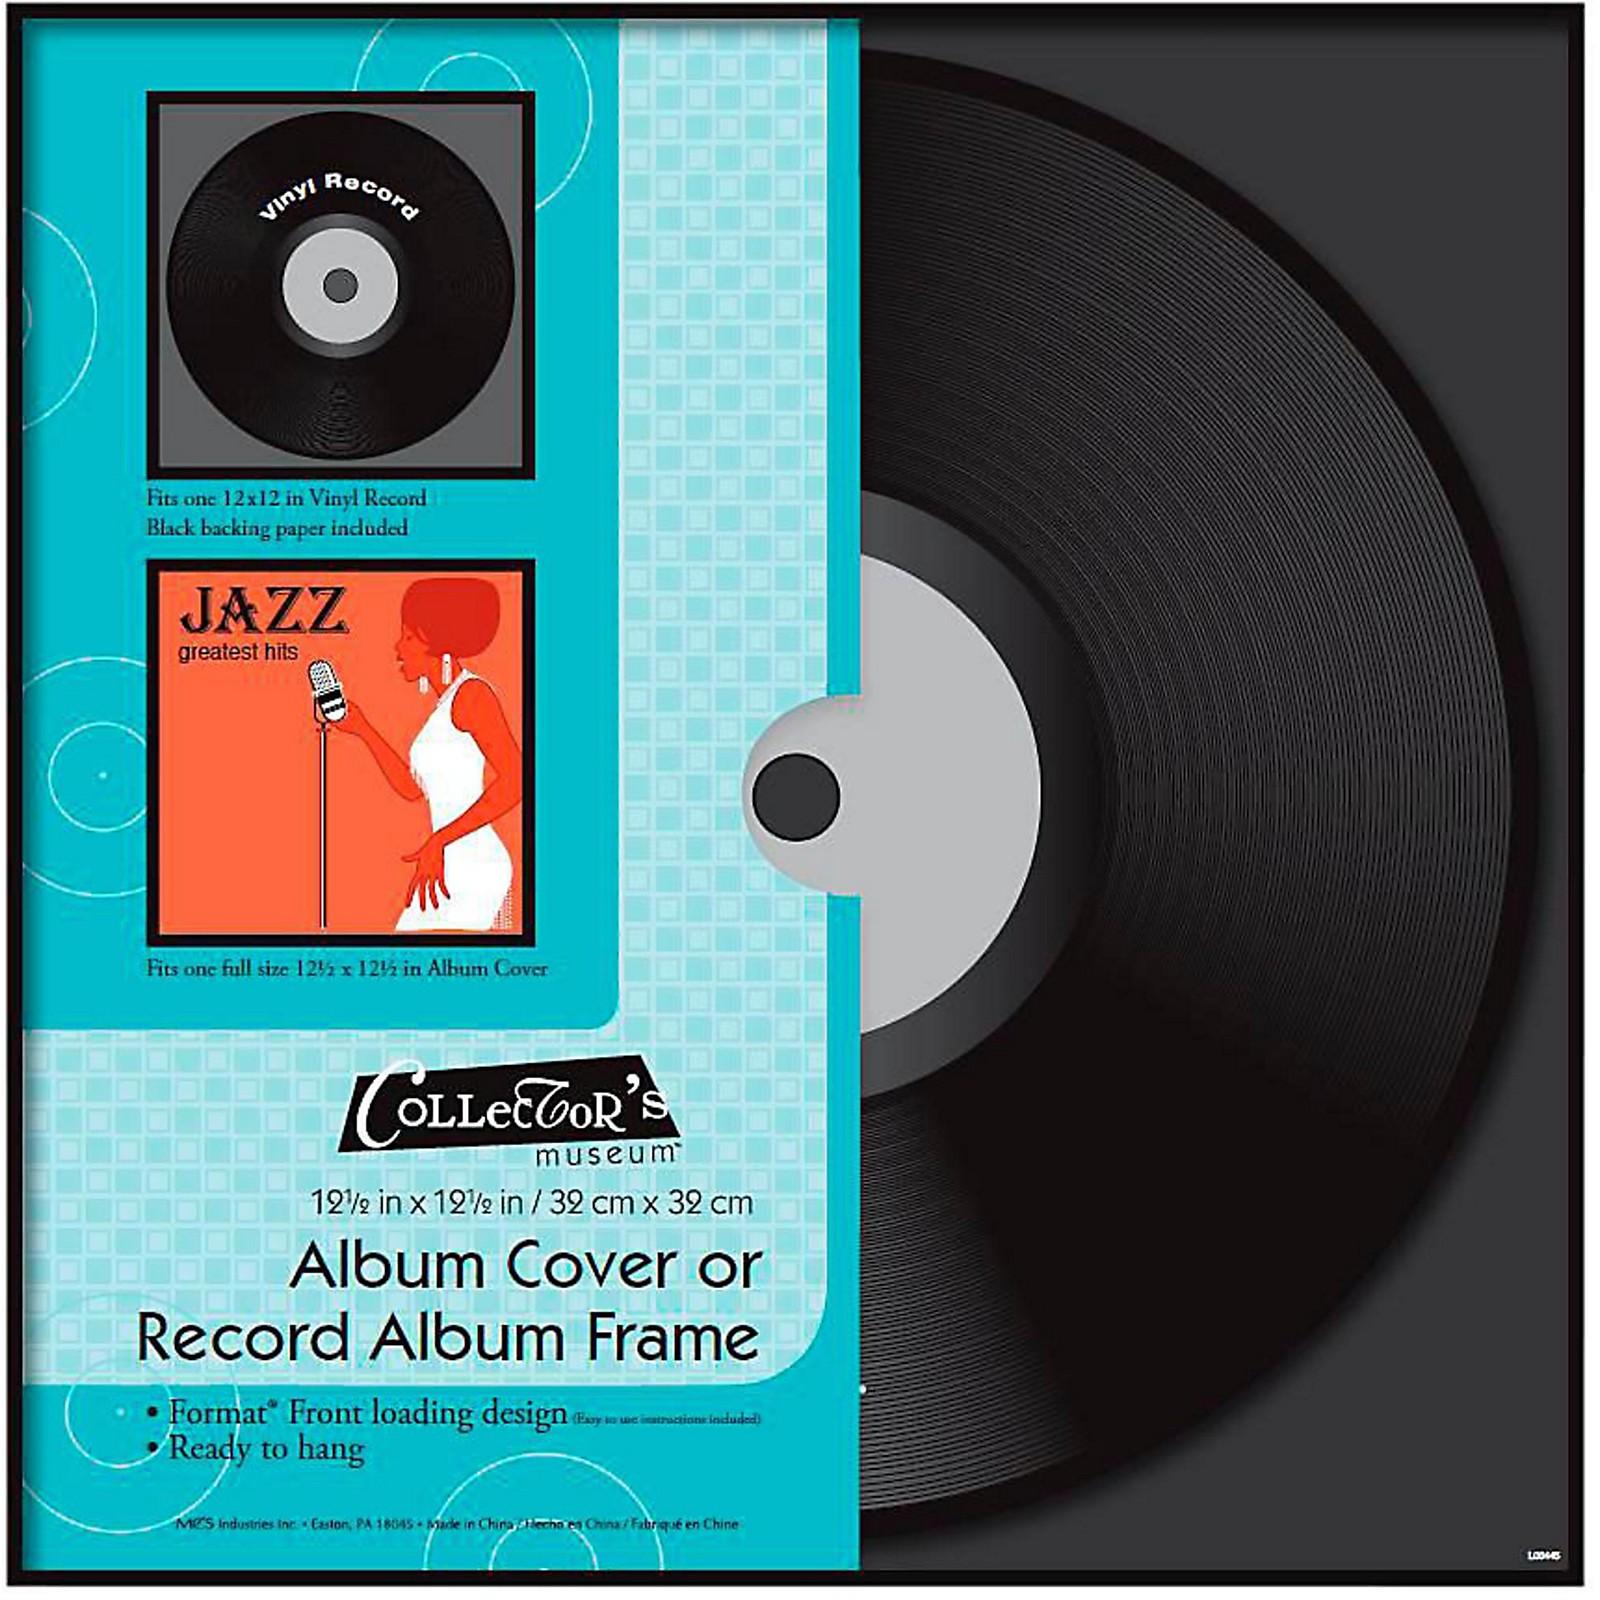 Collector's Museum Vinyl LP Format Record Album Frame Regular